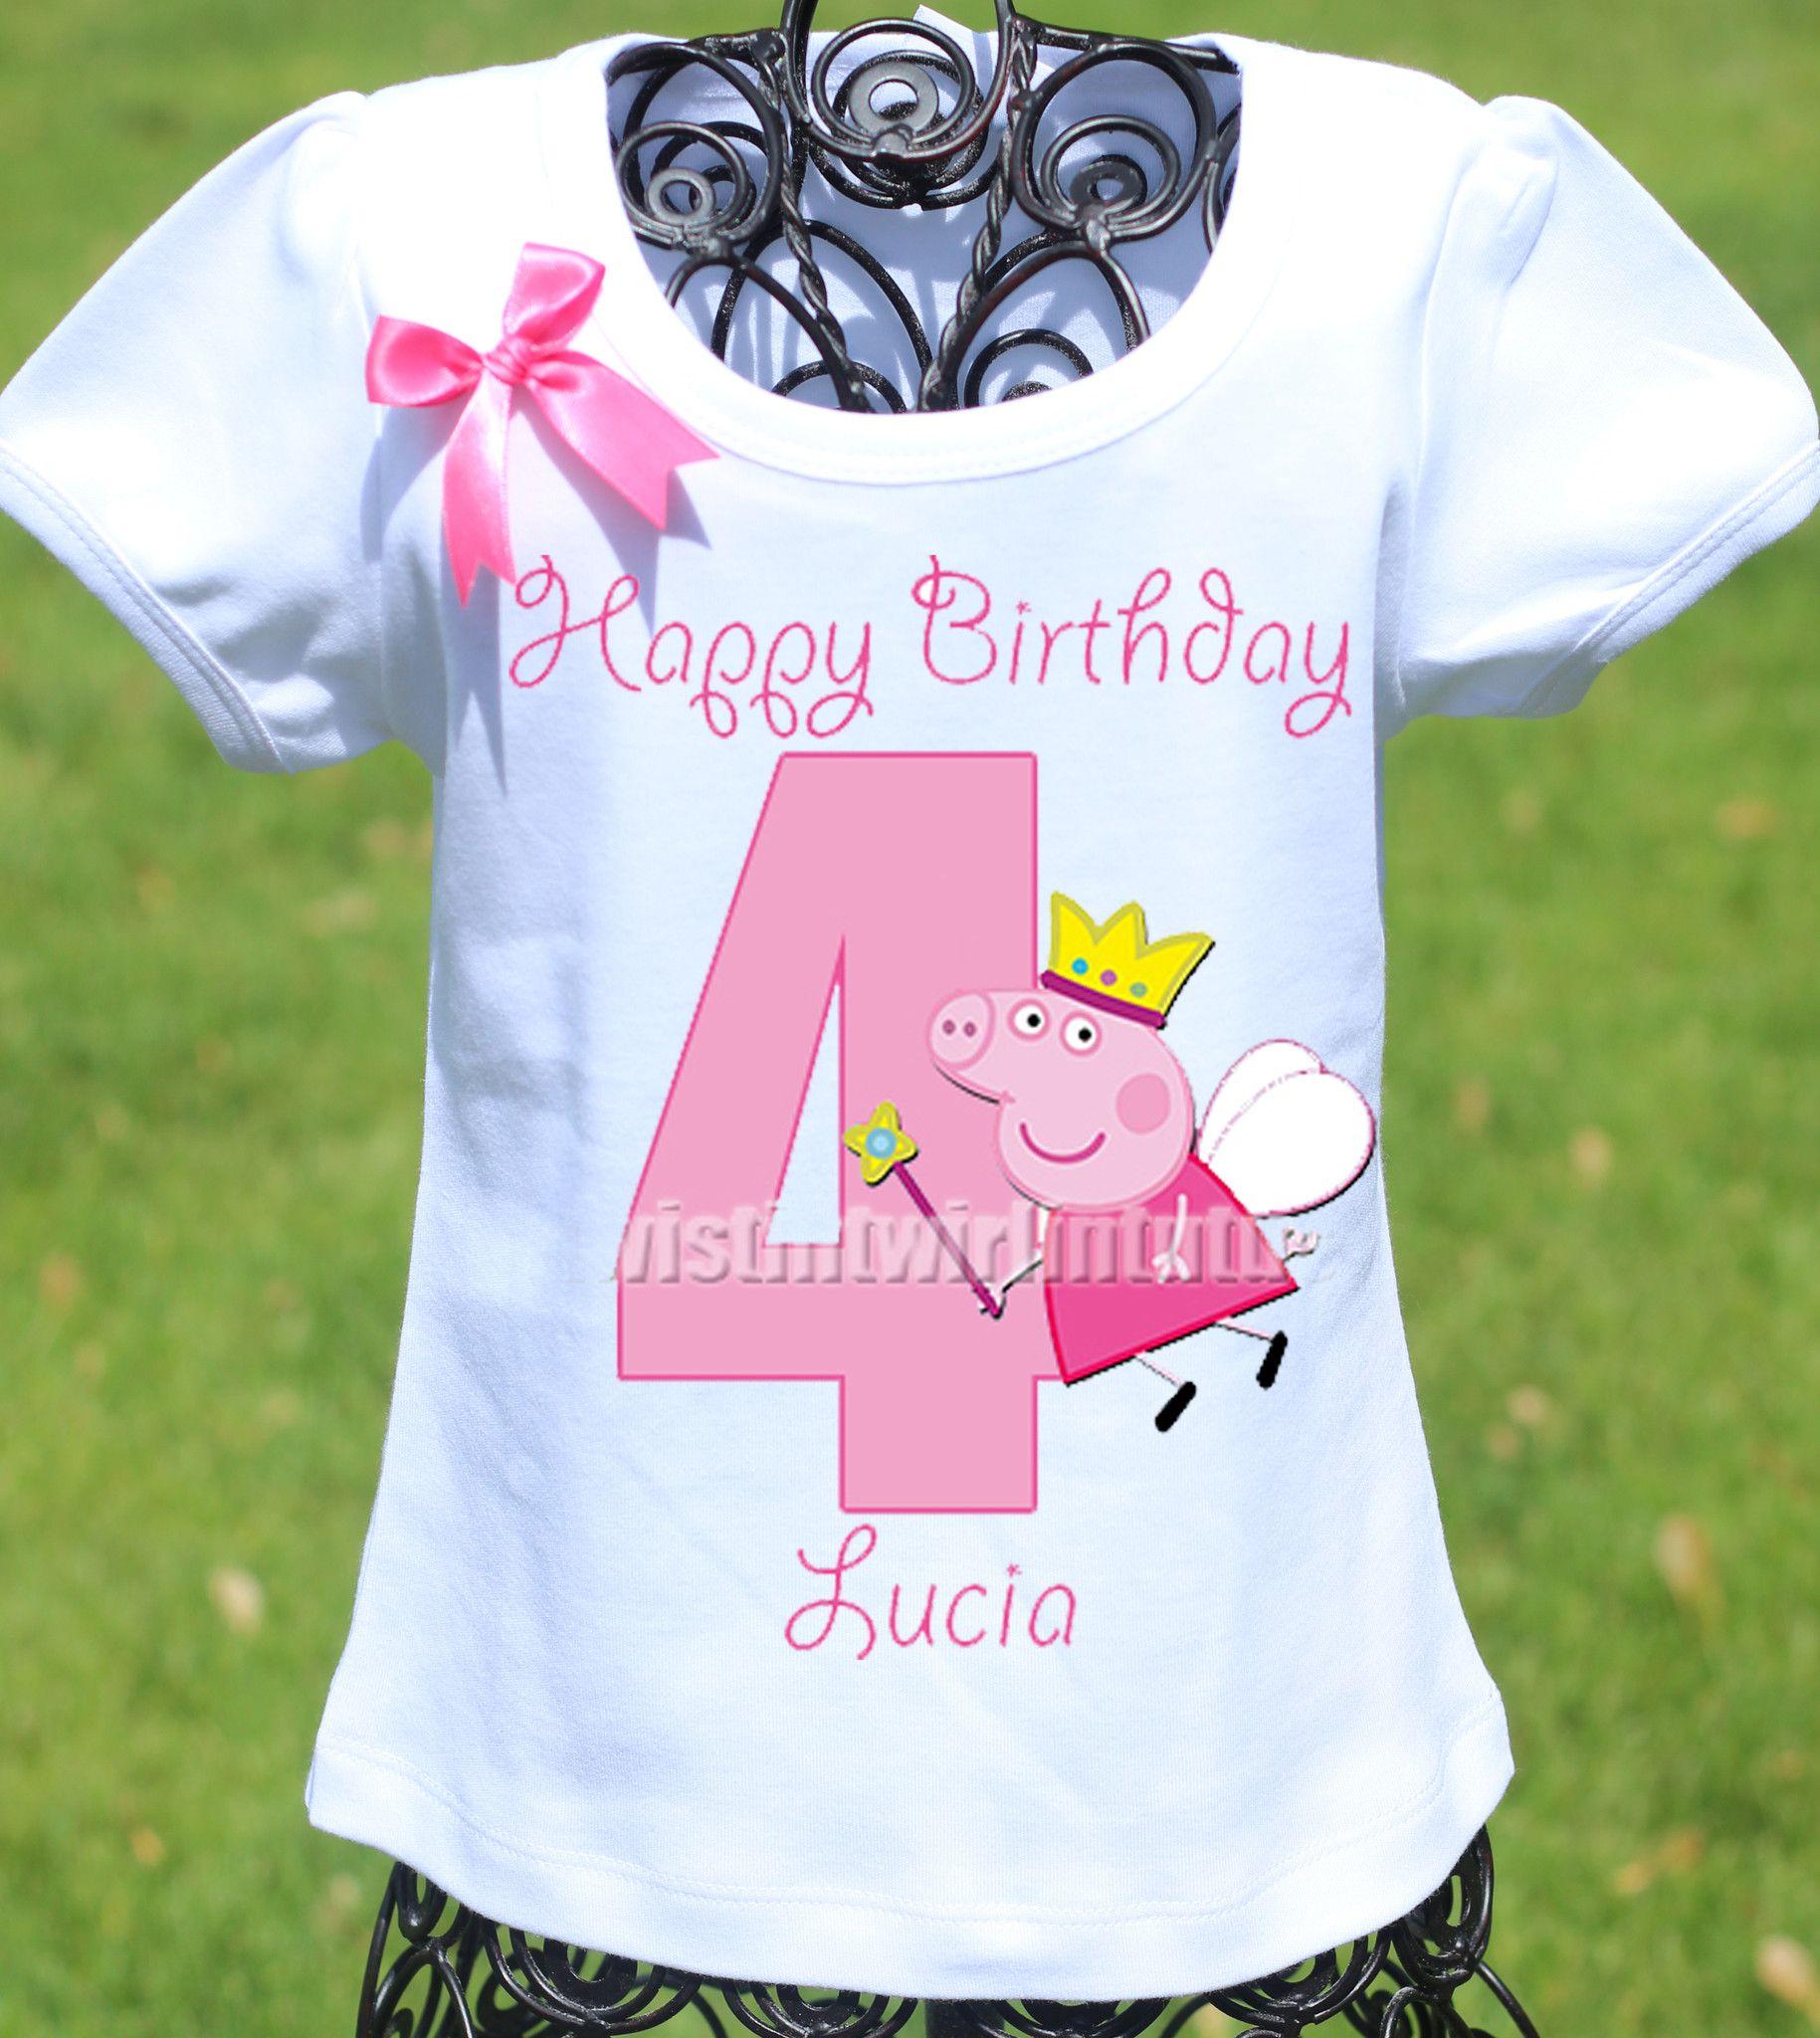 4dbd77d6 Peppa Pig Birthday Shirt | Peppa Pig Birthday Party Ideas | Peppa Pig  Birthday Outfit | Birthday Party Ideas for Girls | Birthday Party Ideas for  Kids ...